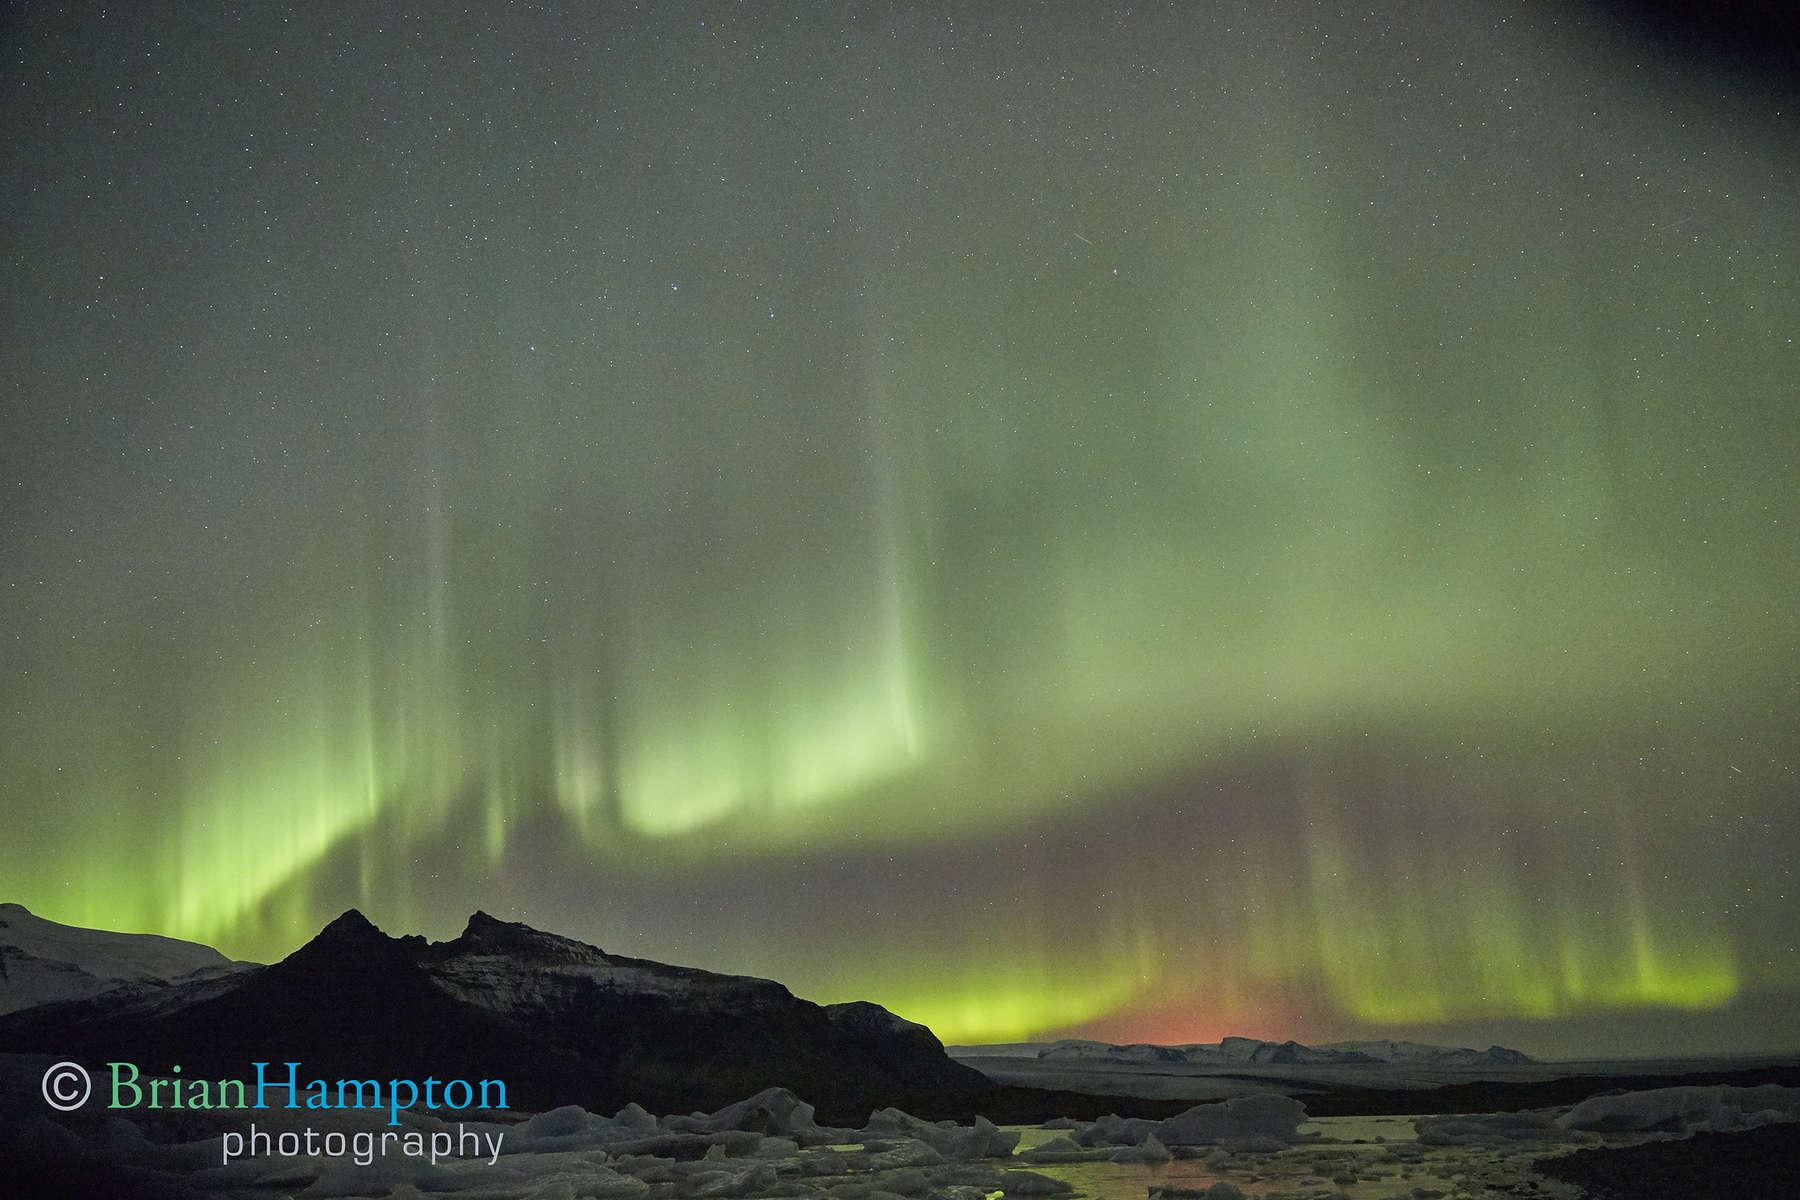 Northern-Lights-with-100km-away-volcano_9935